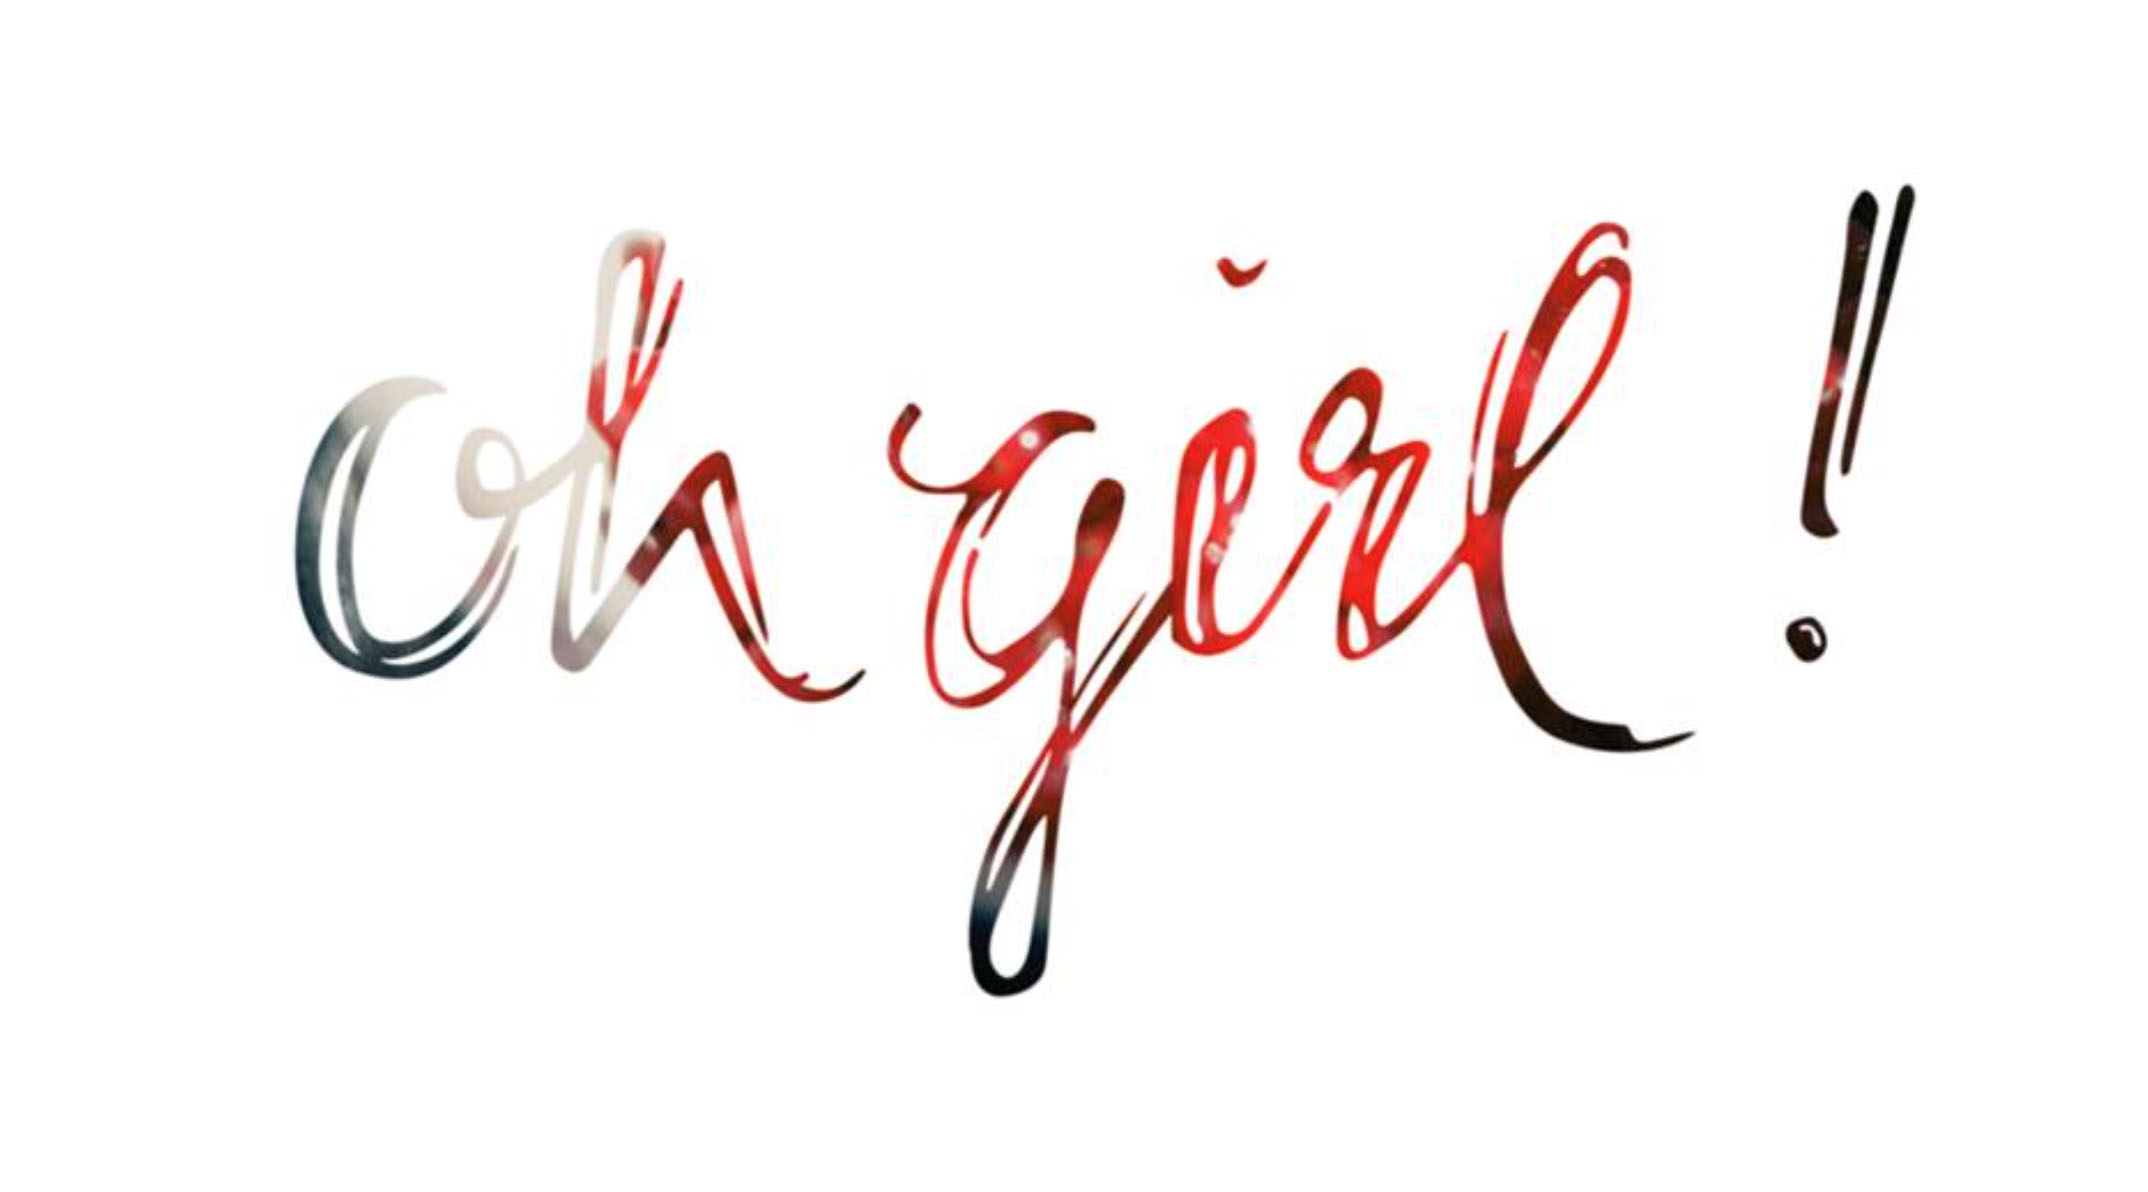 Franziska Schatz Grafik Design | Kommunikationsdesign | Editorial Design | Logo | Branding | Corporate Design | Identity | Werbung | Werbeagentur | Kaufbeuren | Allgäu, plattencover, cd design, cd hülle, cd cover, band, musik, music